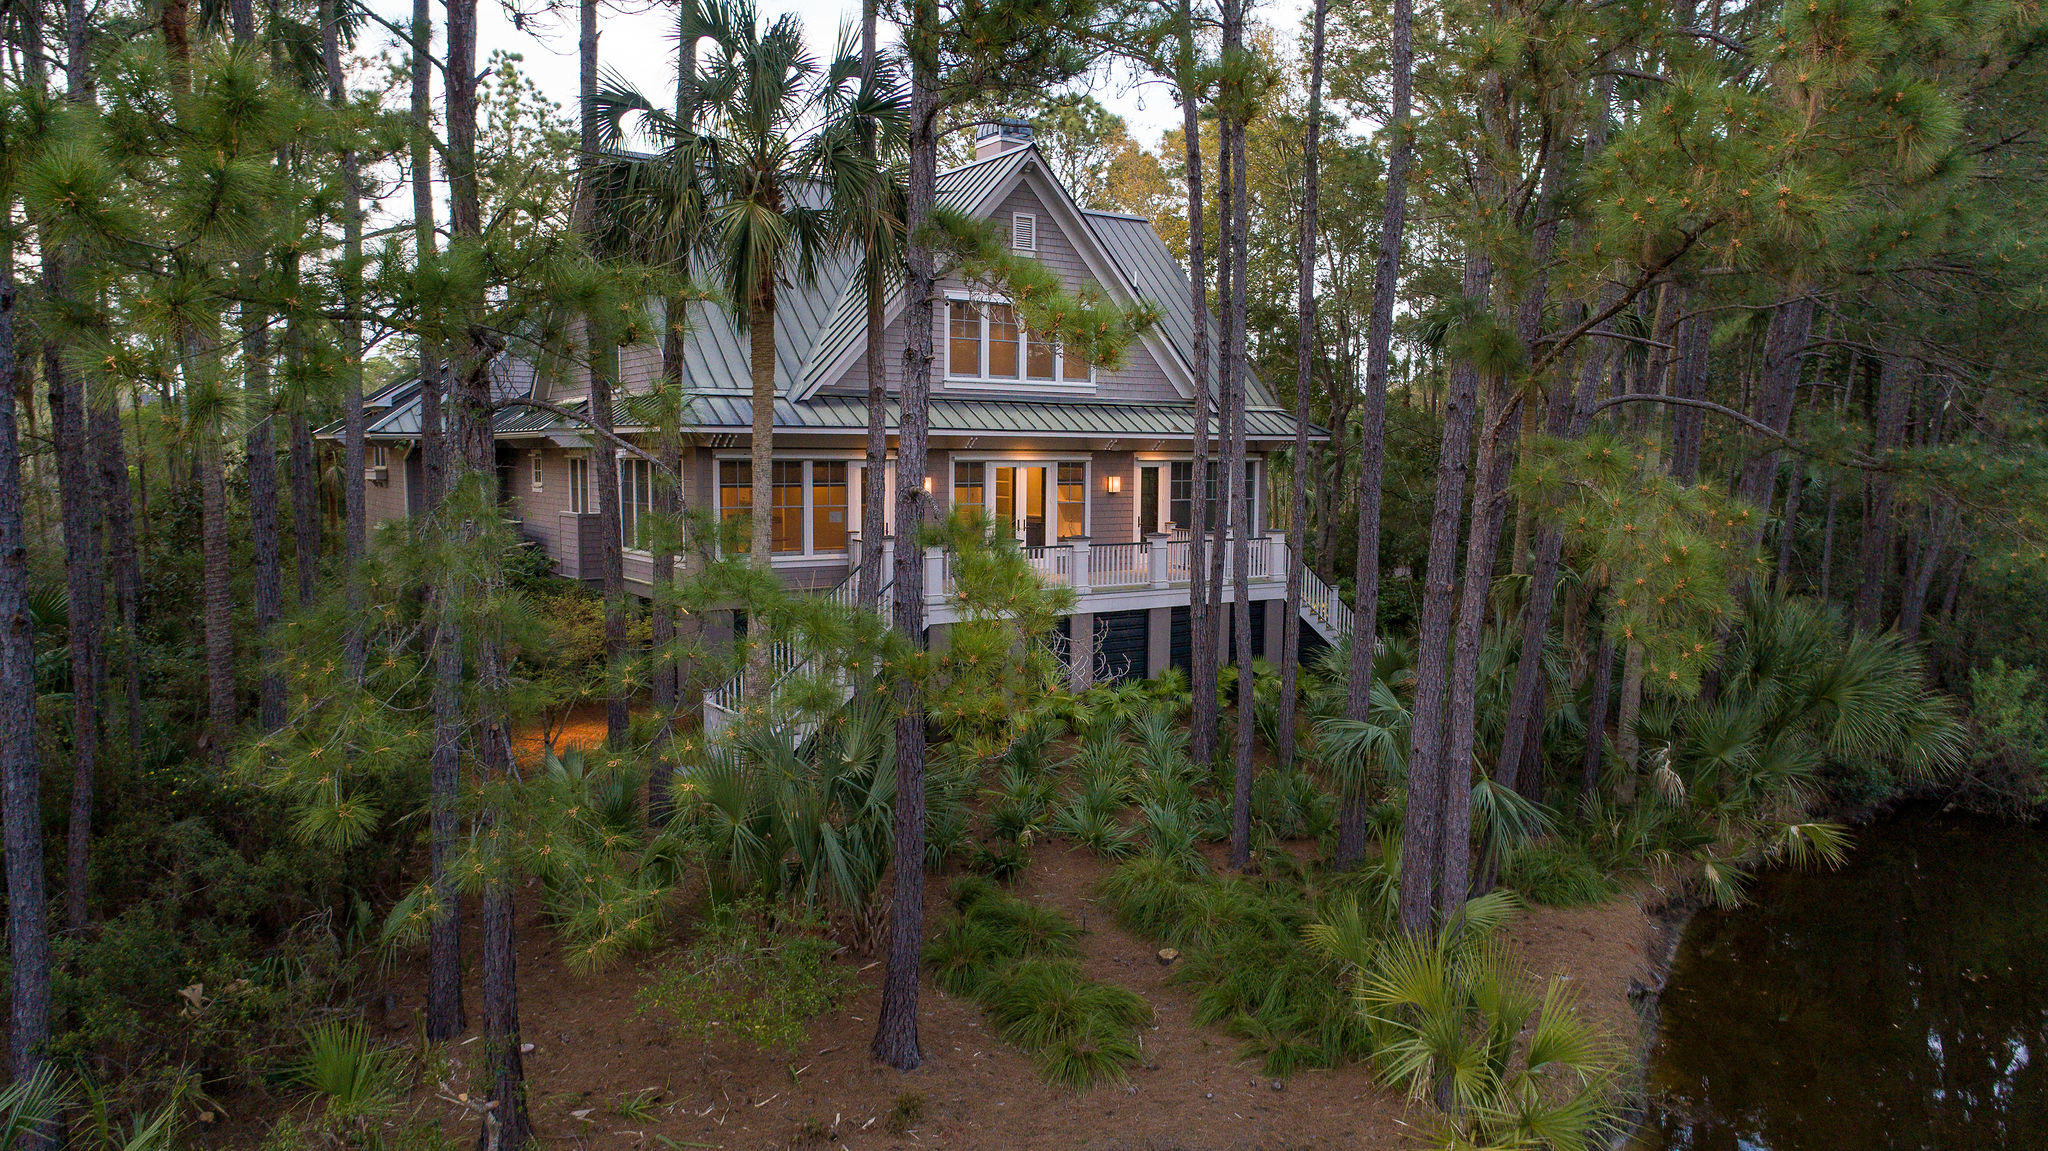 Kiawah Island Homes For Sale - 3 Grey Widgeon, Kiawah Island, SC - 66